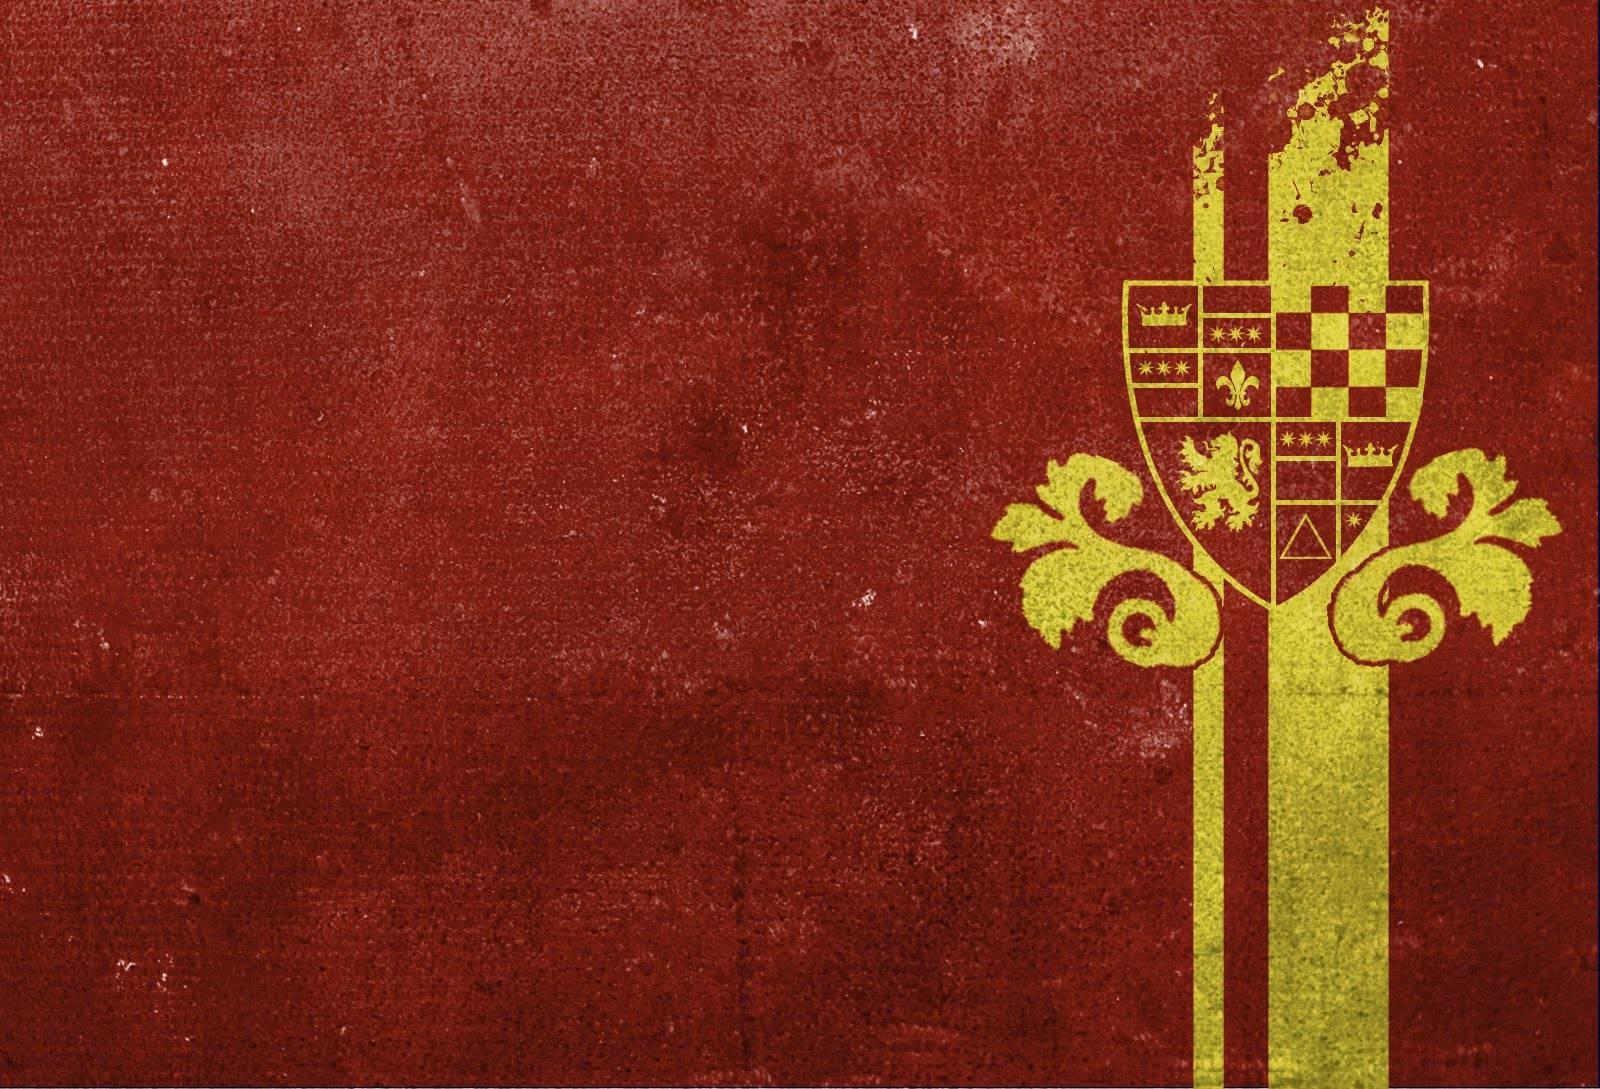 Ipad Gryffindor Wallpapers On Wallpaperdog